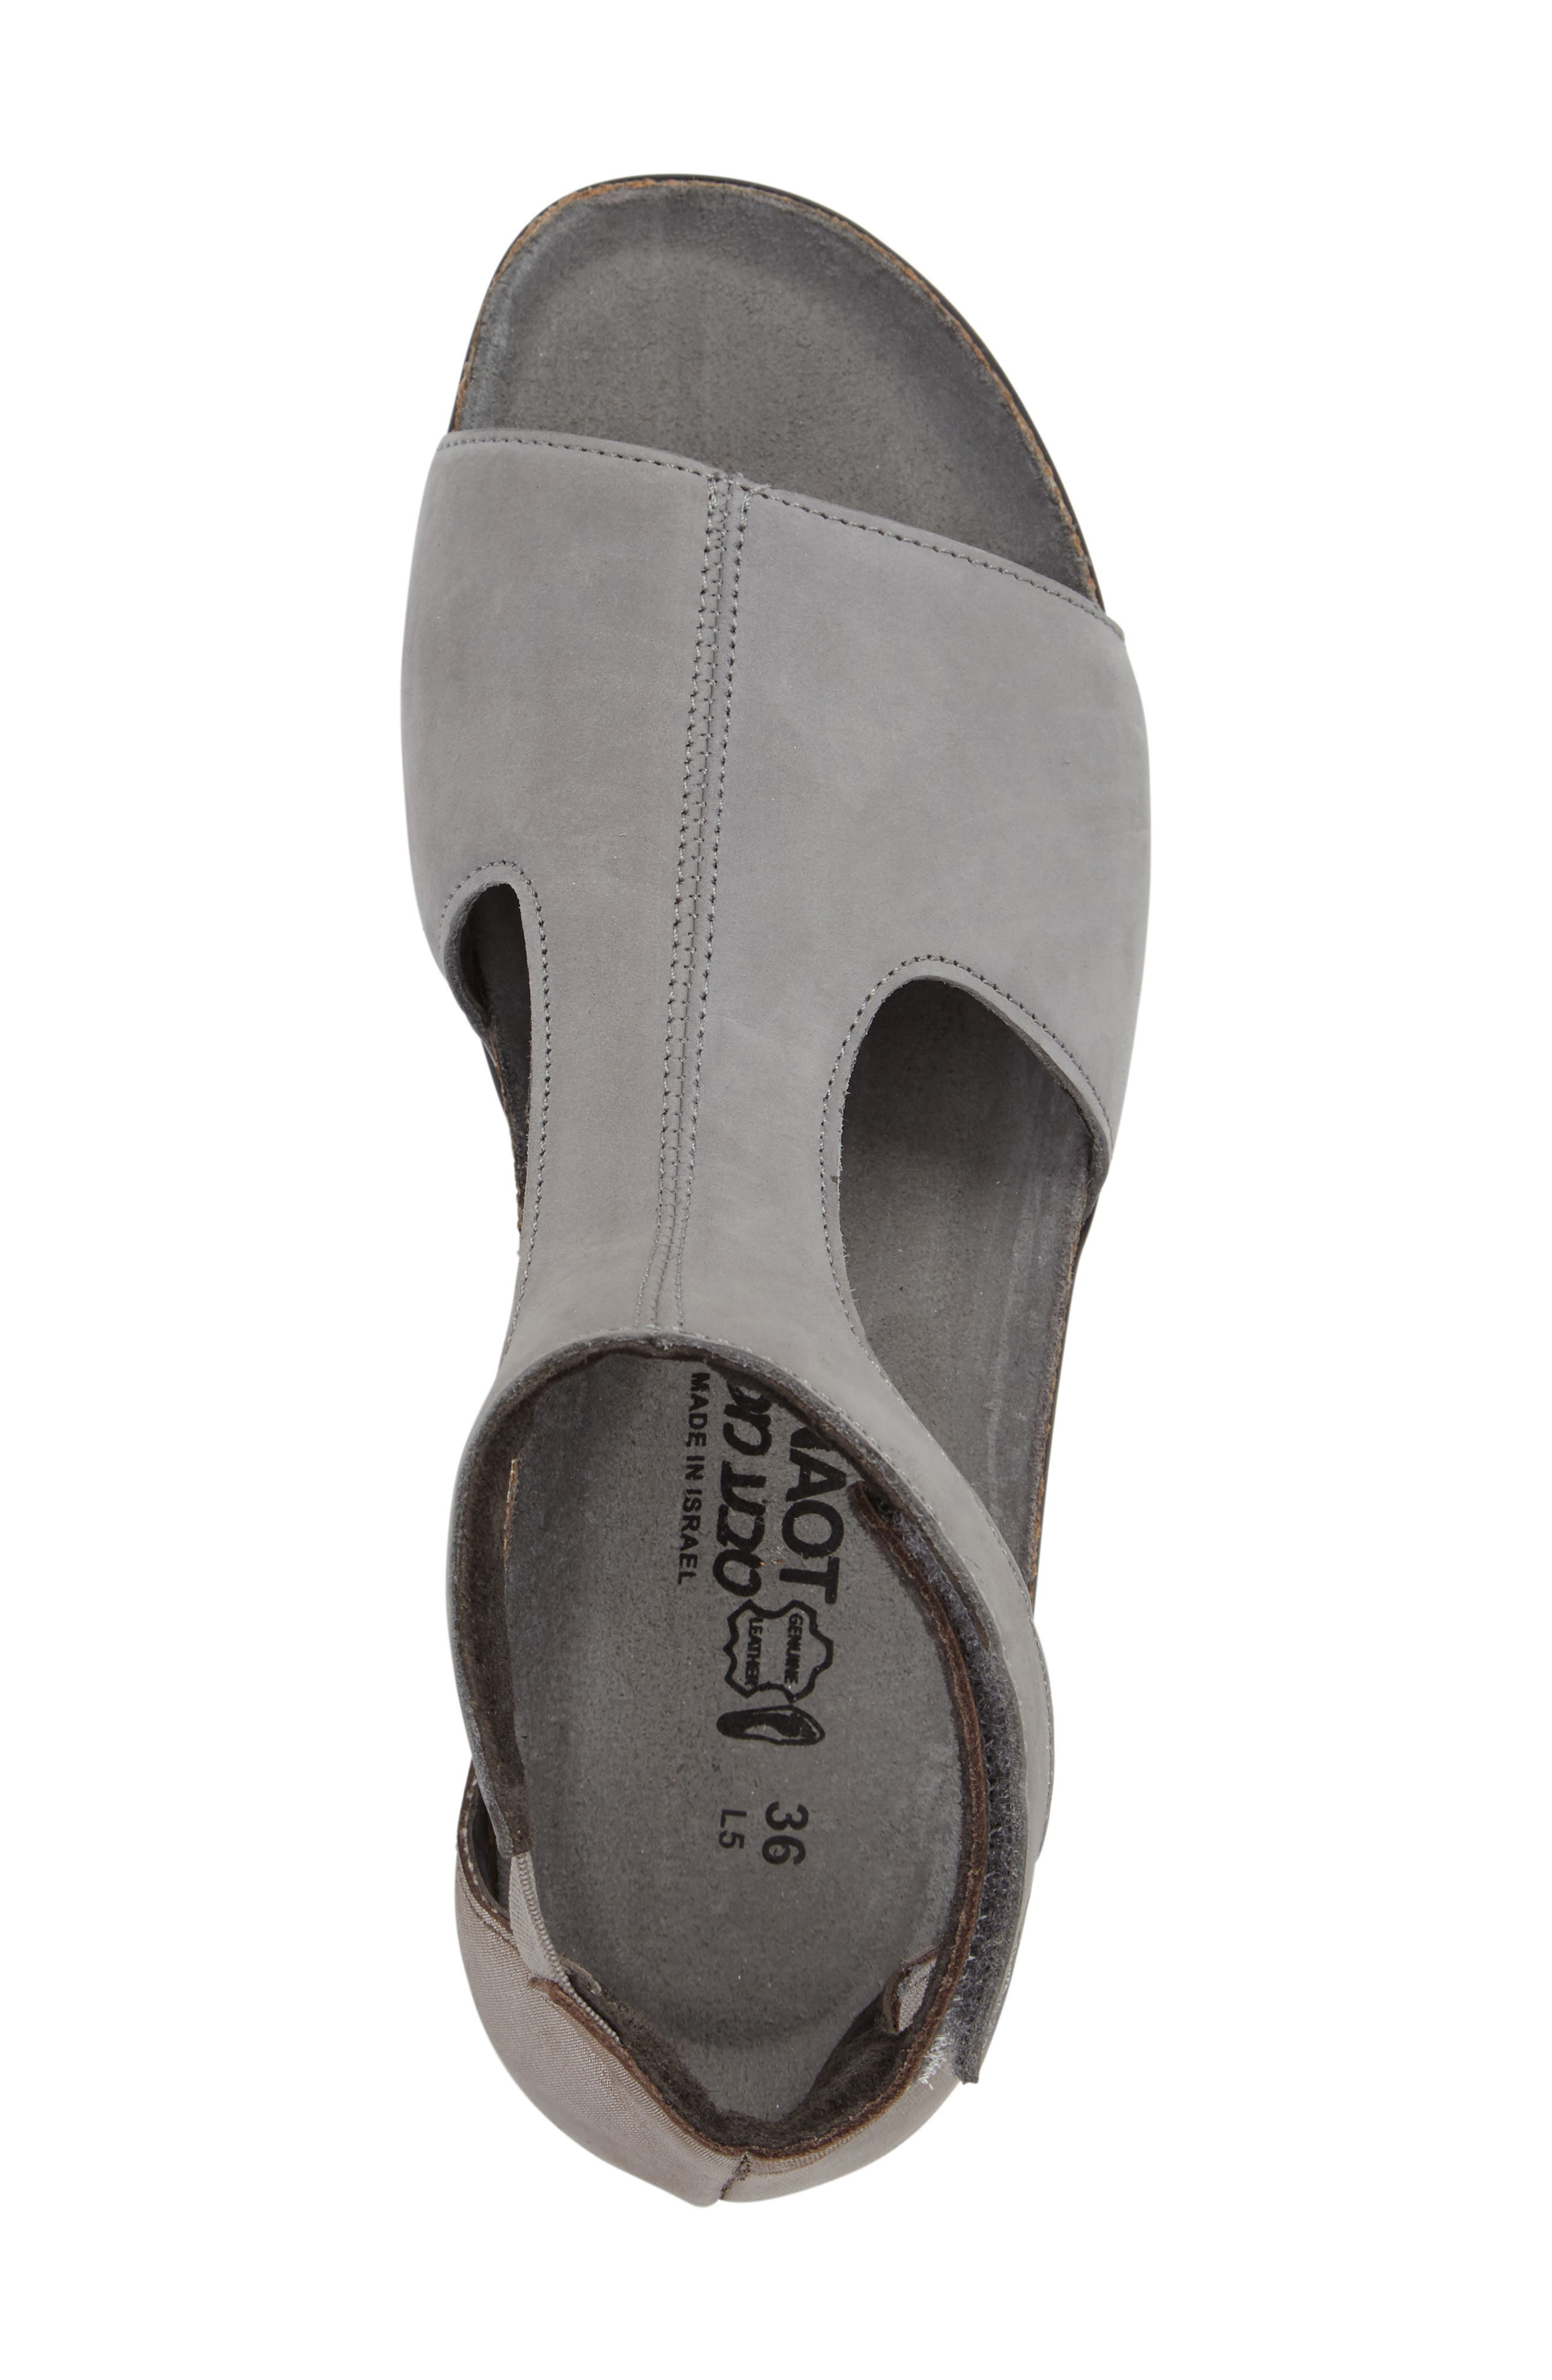 Nala Sandal,                             Alternate thumbnail 3, color,                             Grey/ Silver Nubuck Leather